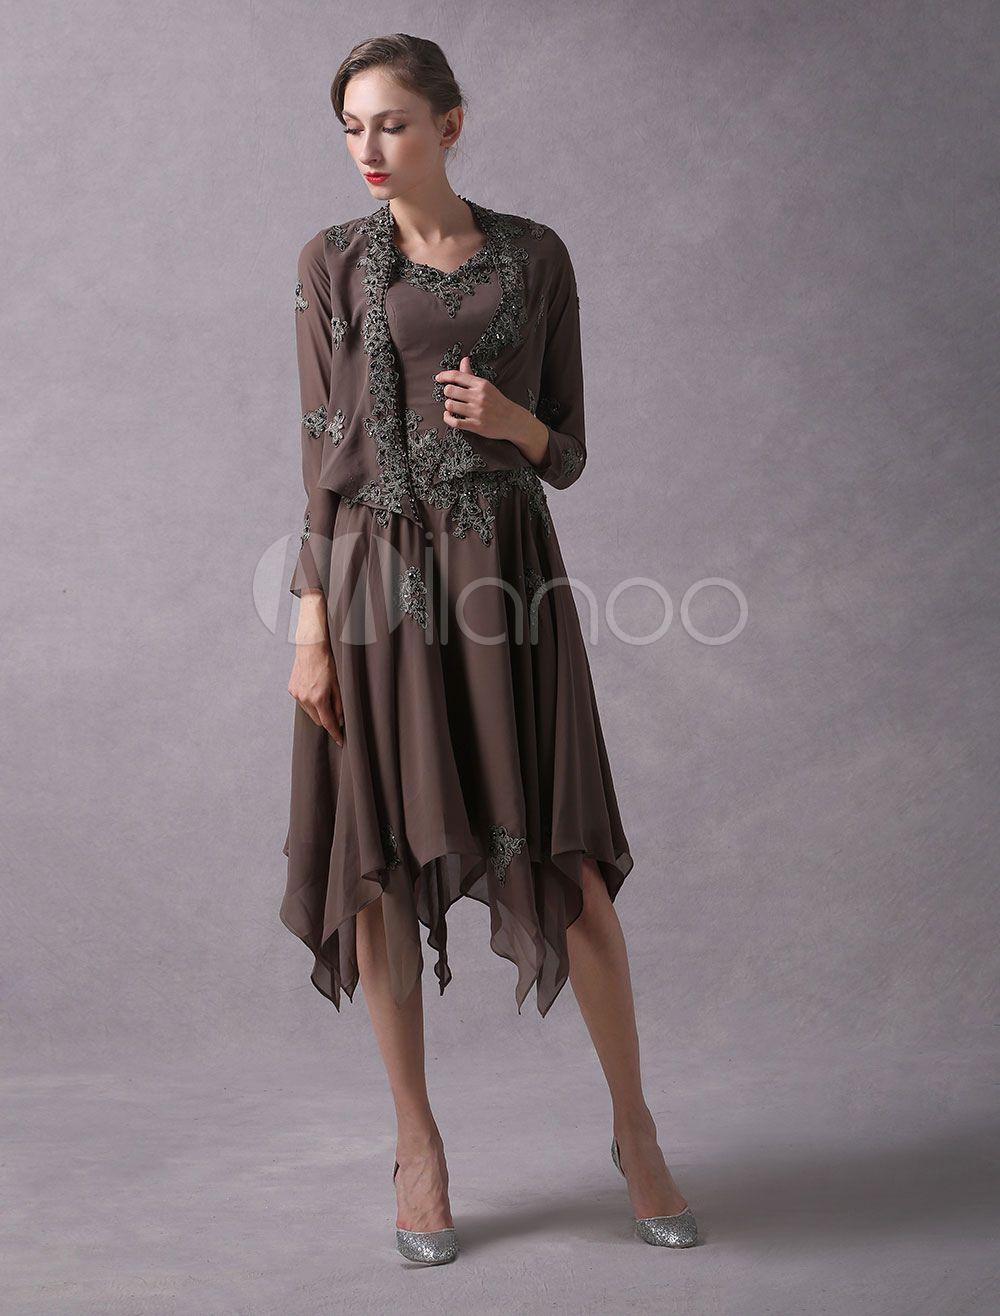 a69631206e178 Wedding Guest Dresses Lace Applique Chiffon Short Mother Dresses Beaded V  Neck Asymmetrical Wedding Party Dress